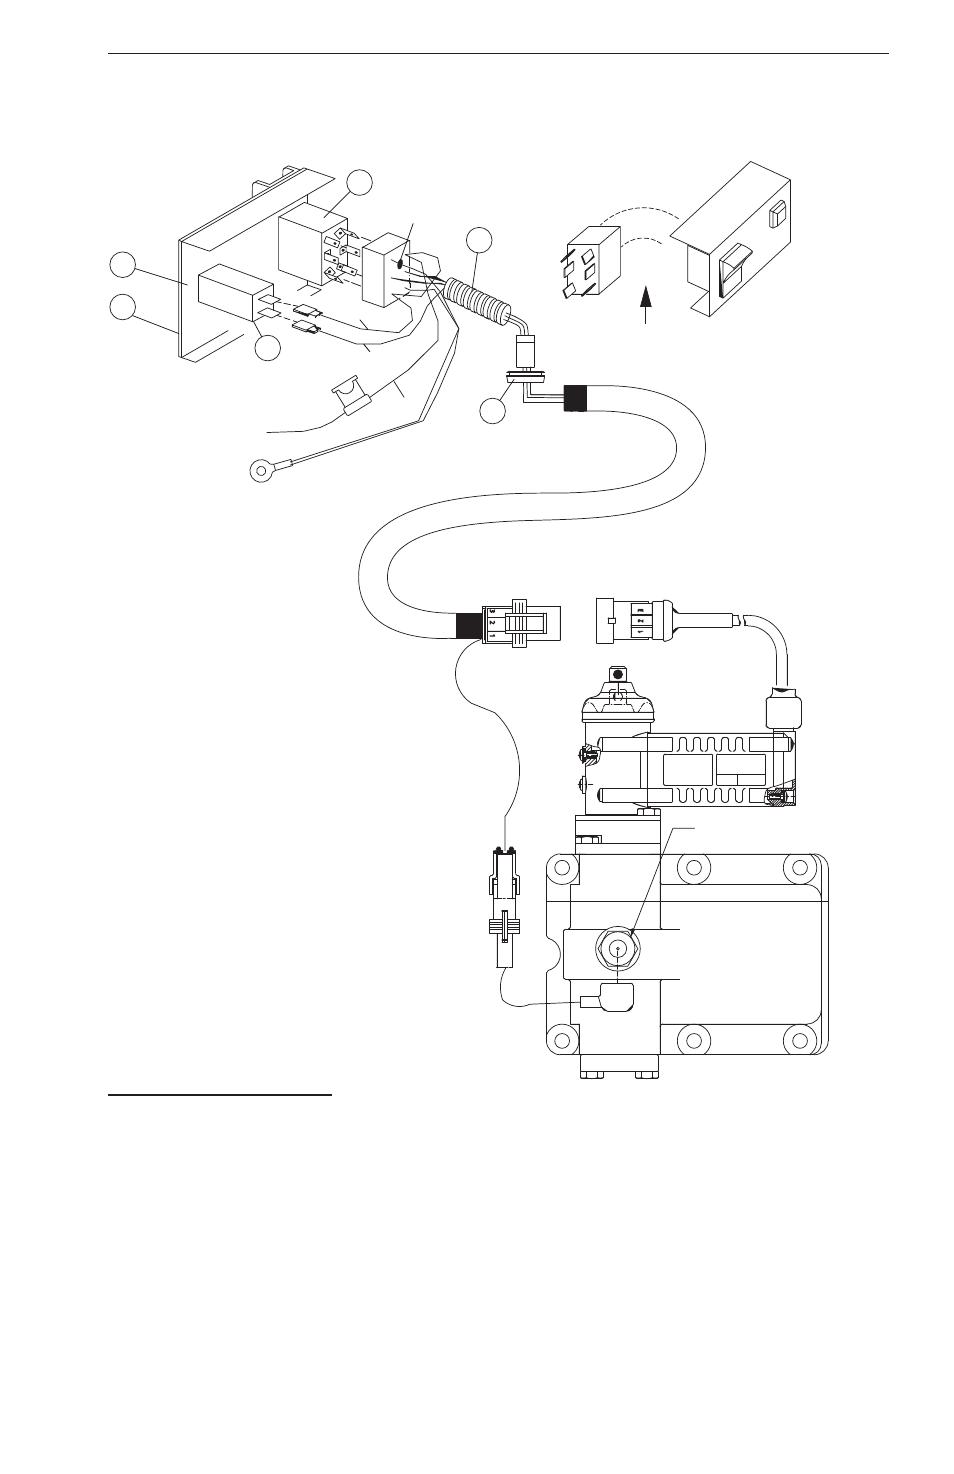 Of 2806 Rth7400d 1008 Wiring Diagram Wiring Diagram